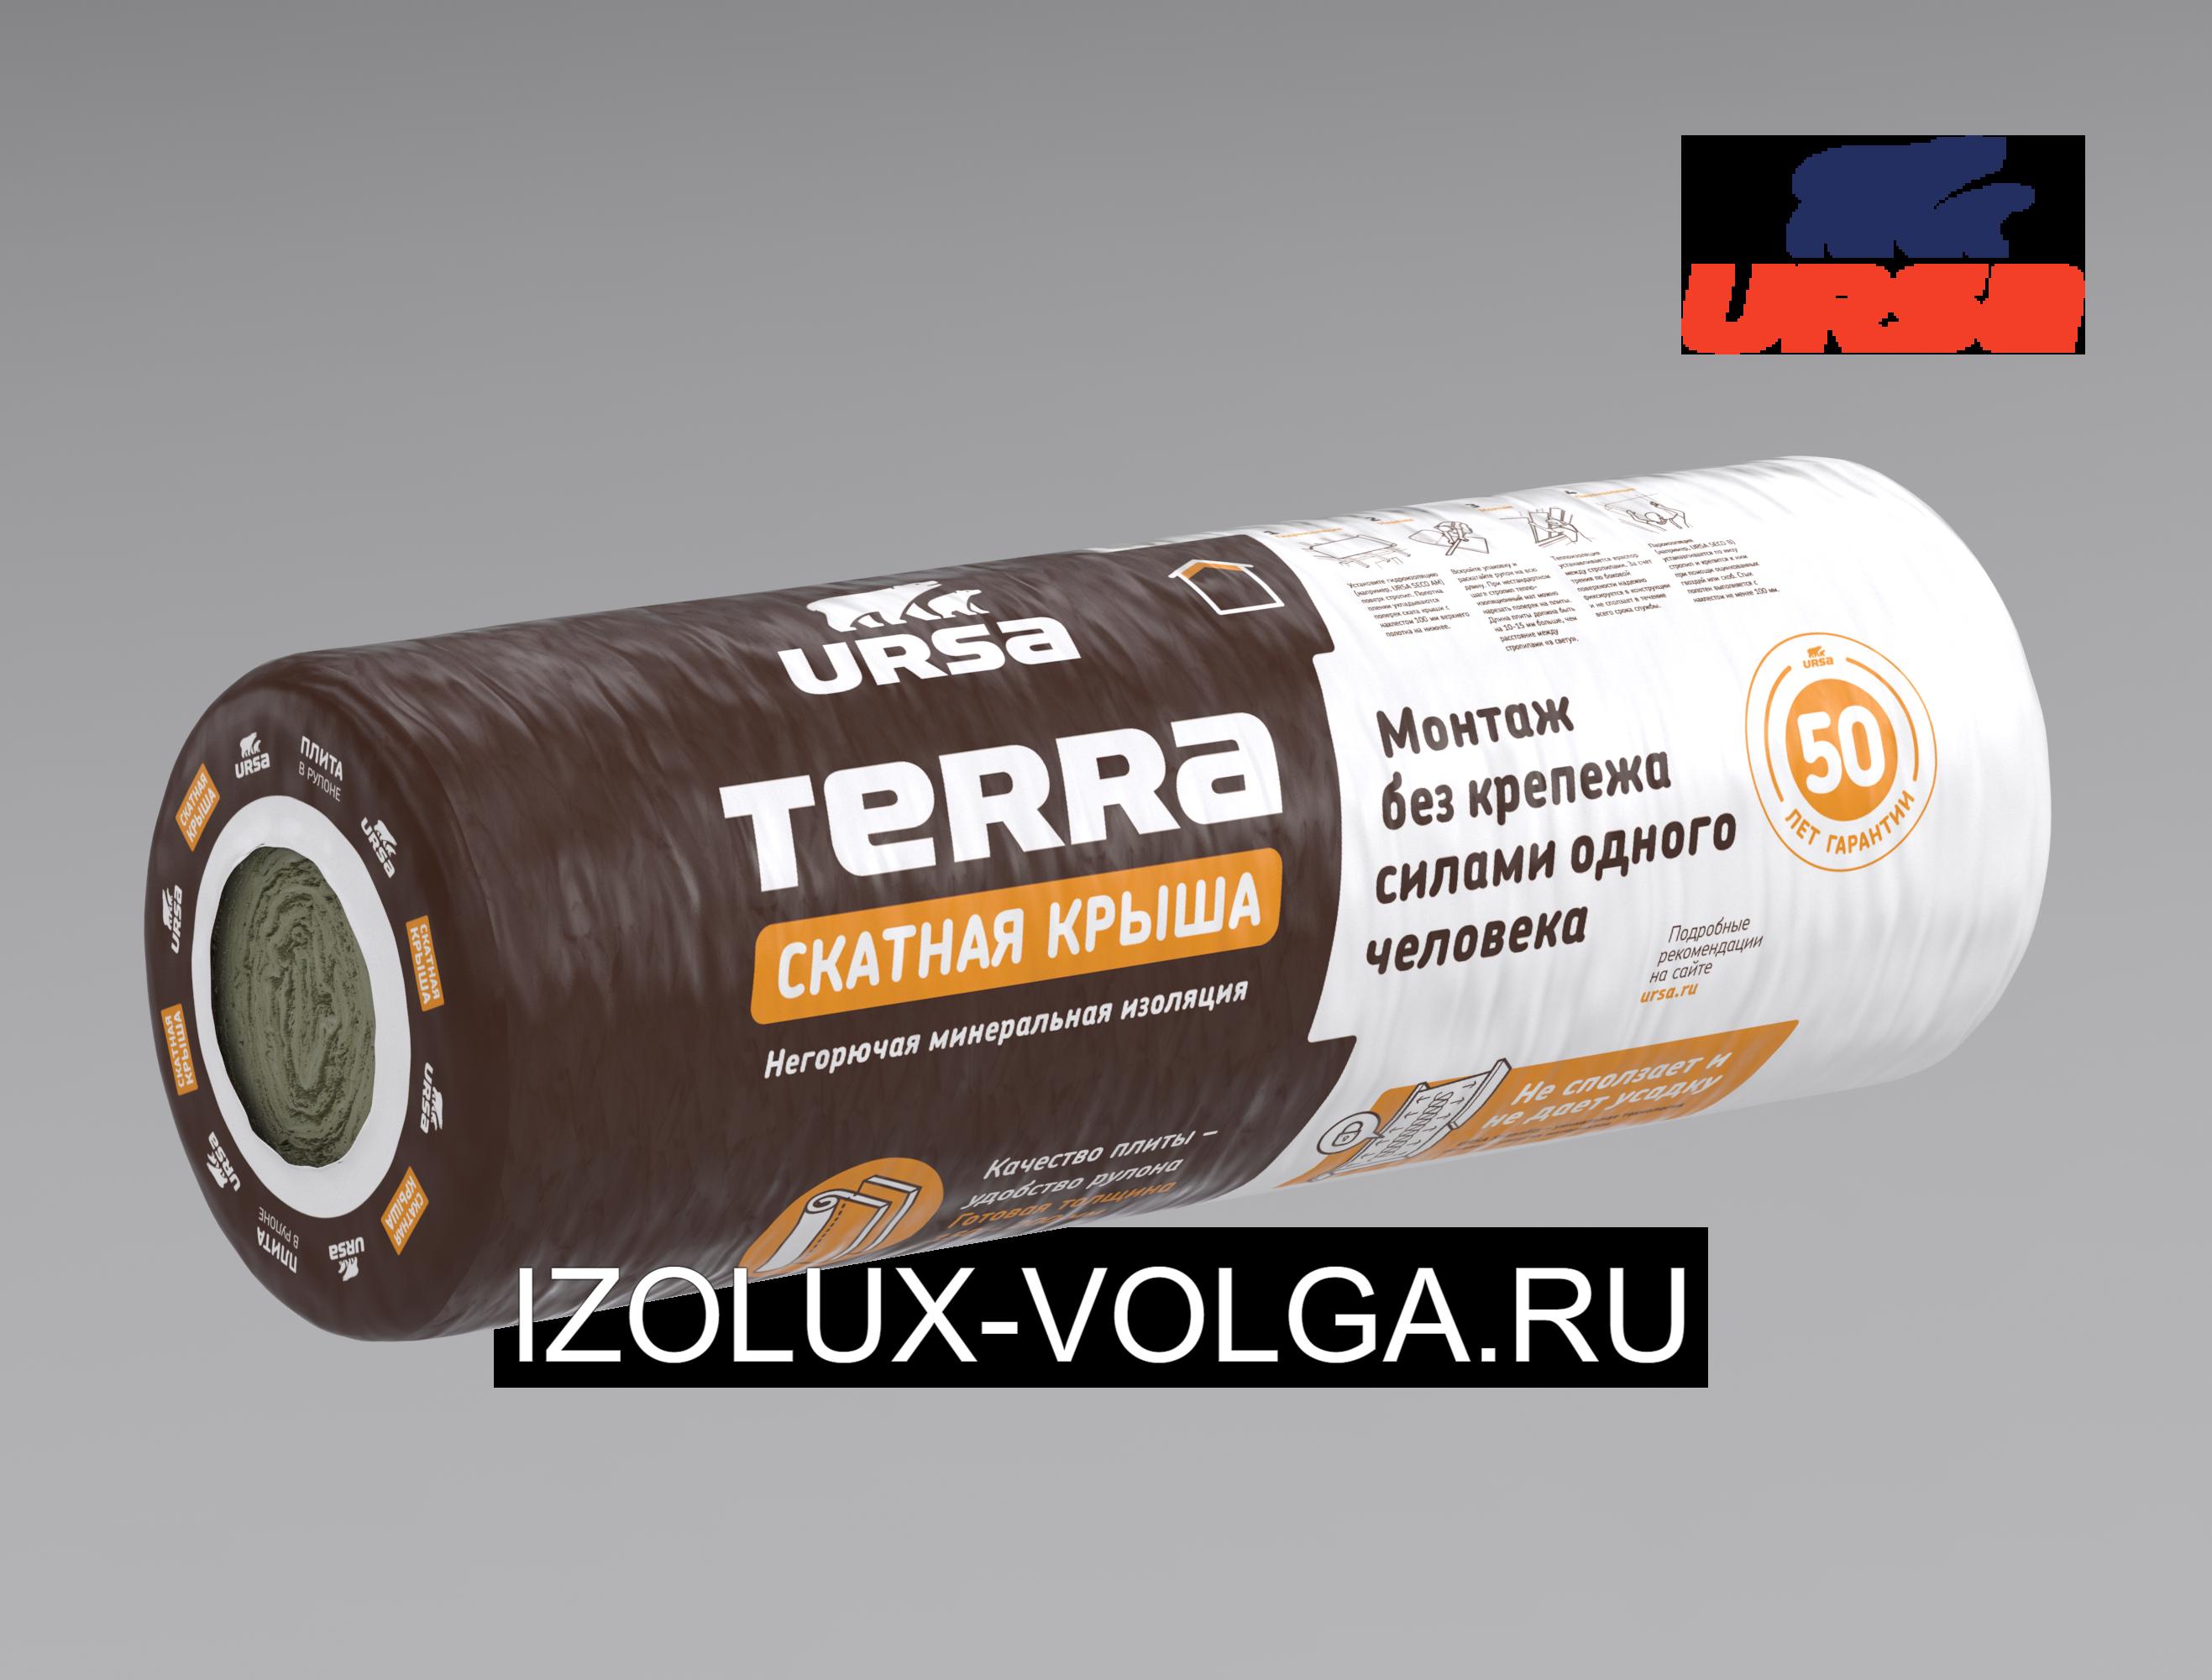 URSA TERRA Скатная крыша 35 QN 3000x1200x180 4,2 м2